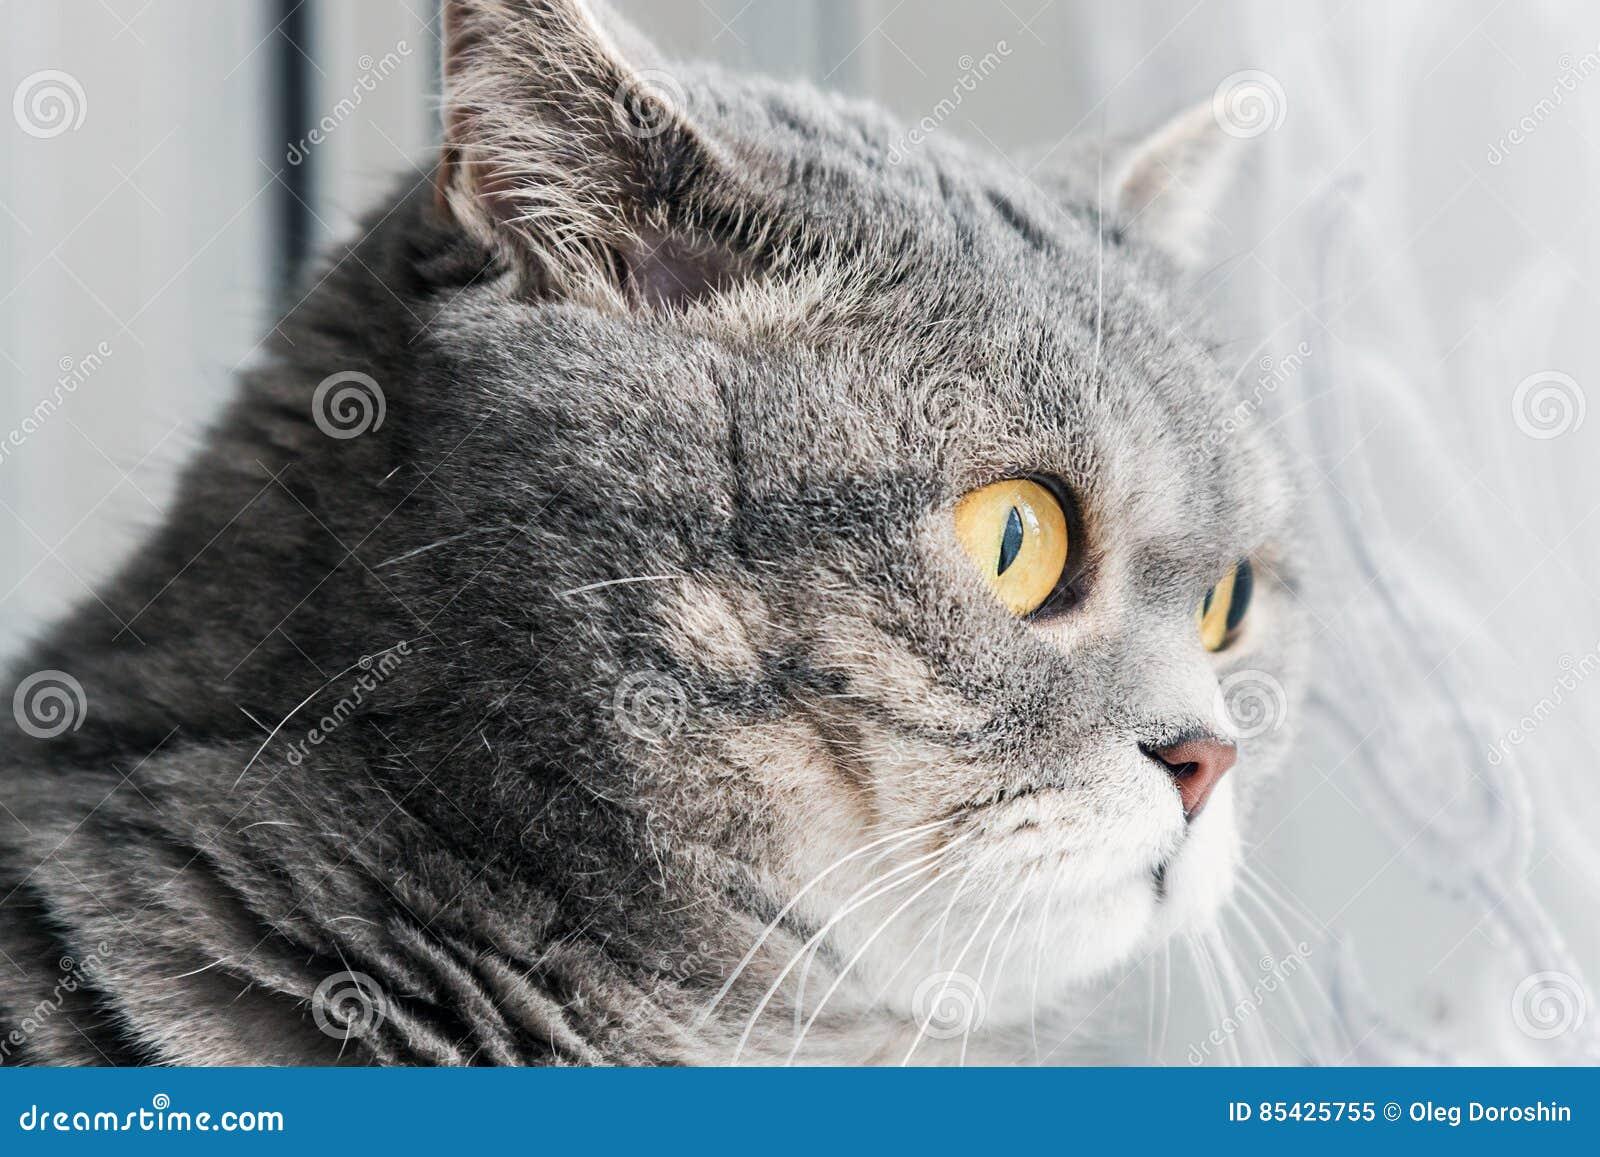 Gato britânico que olha atentamente na janela